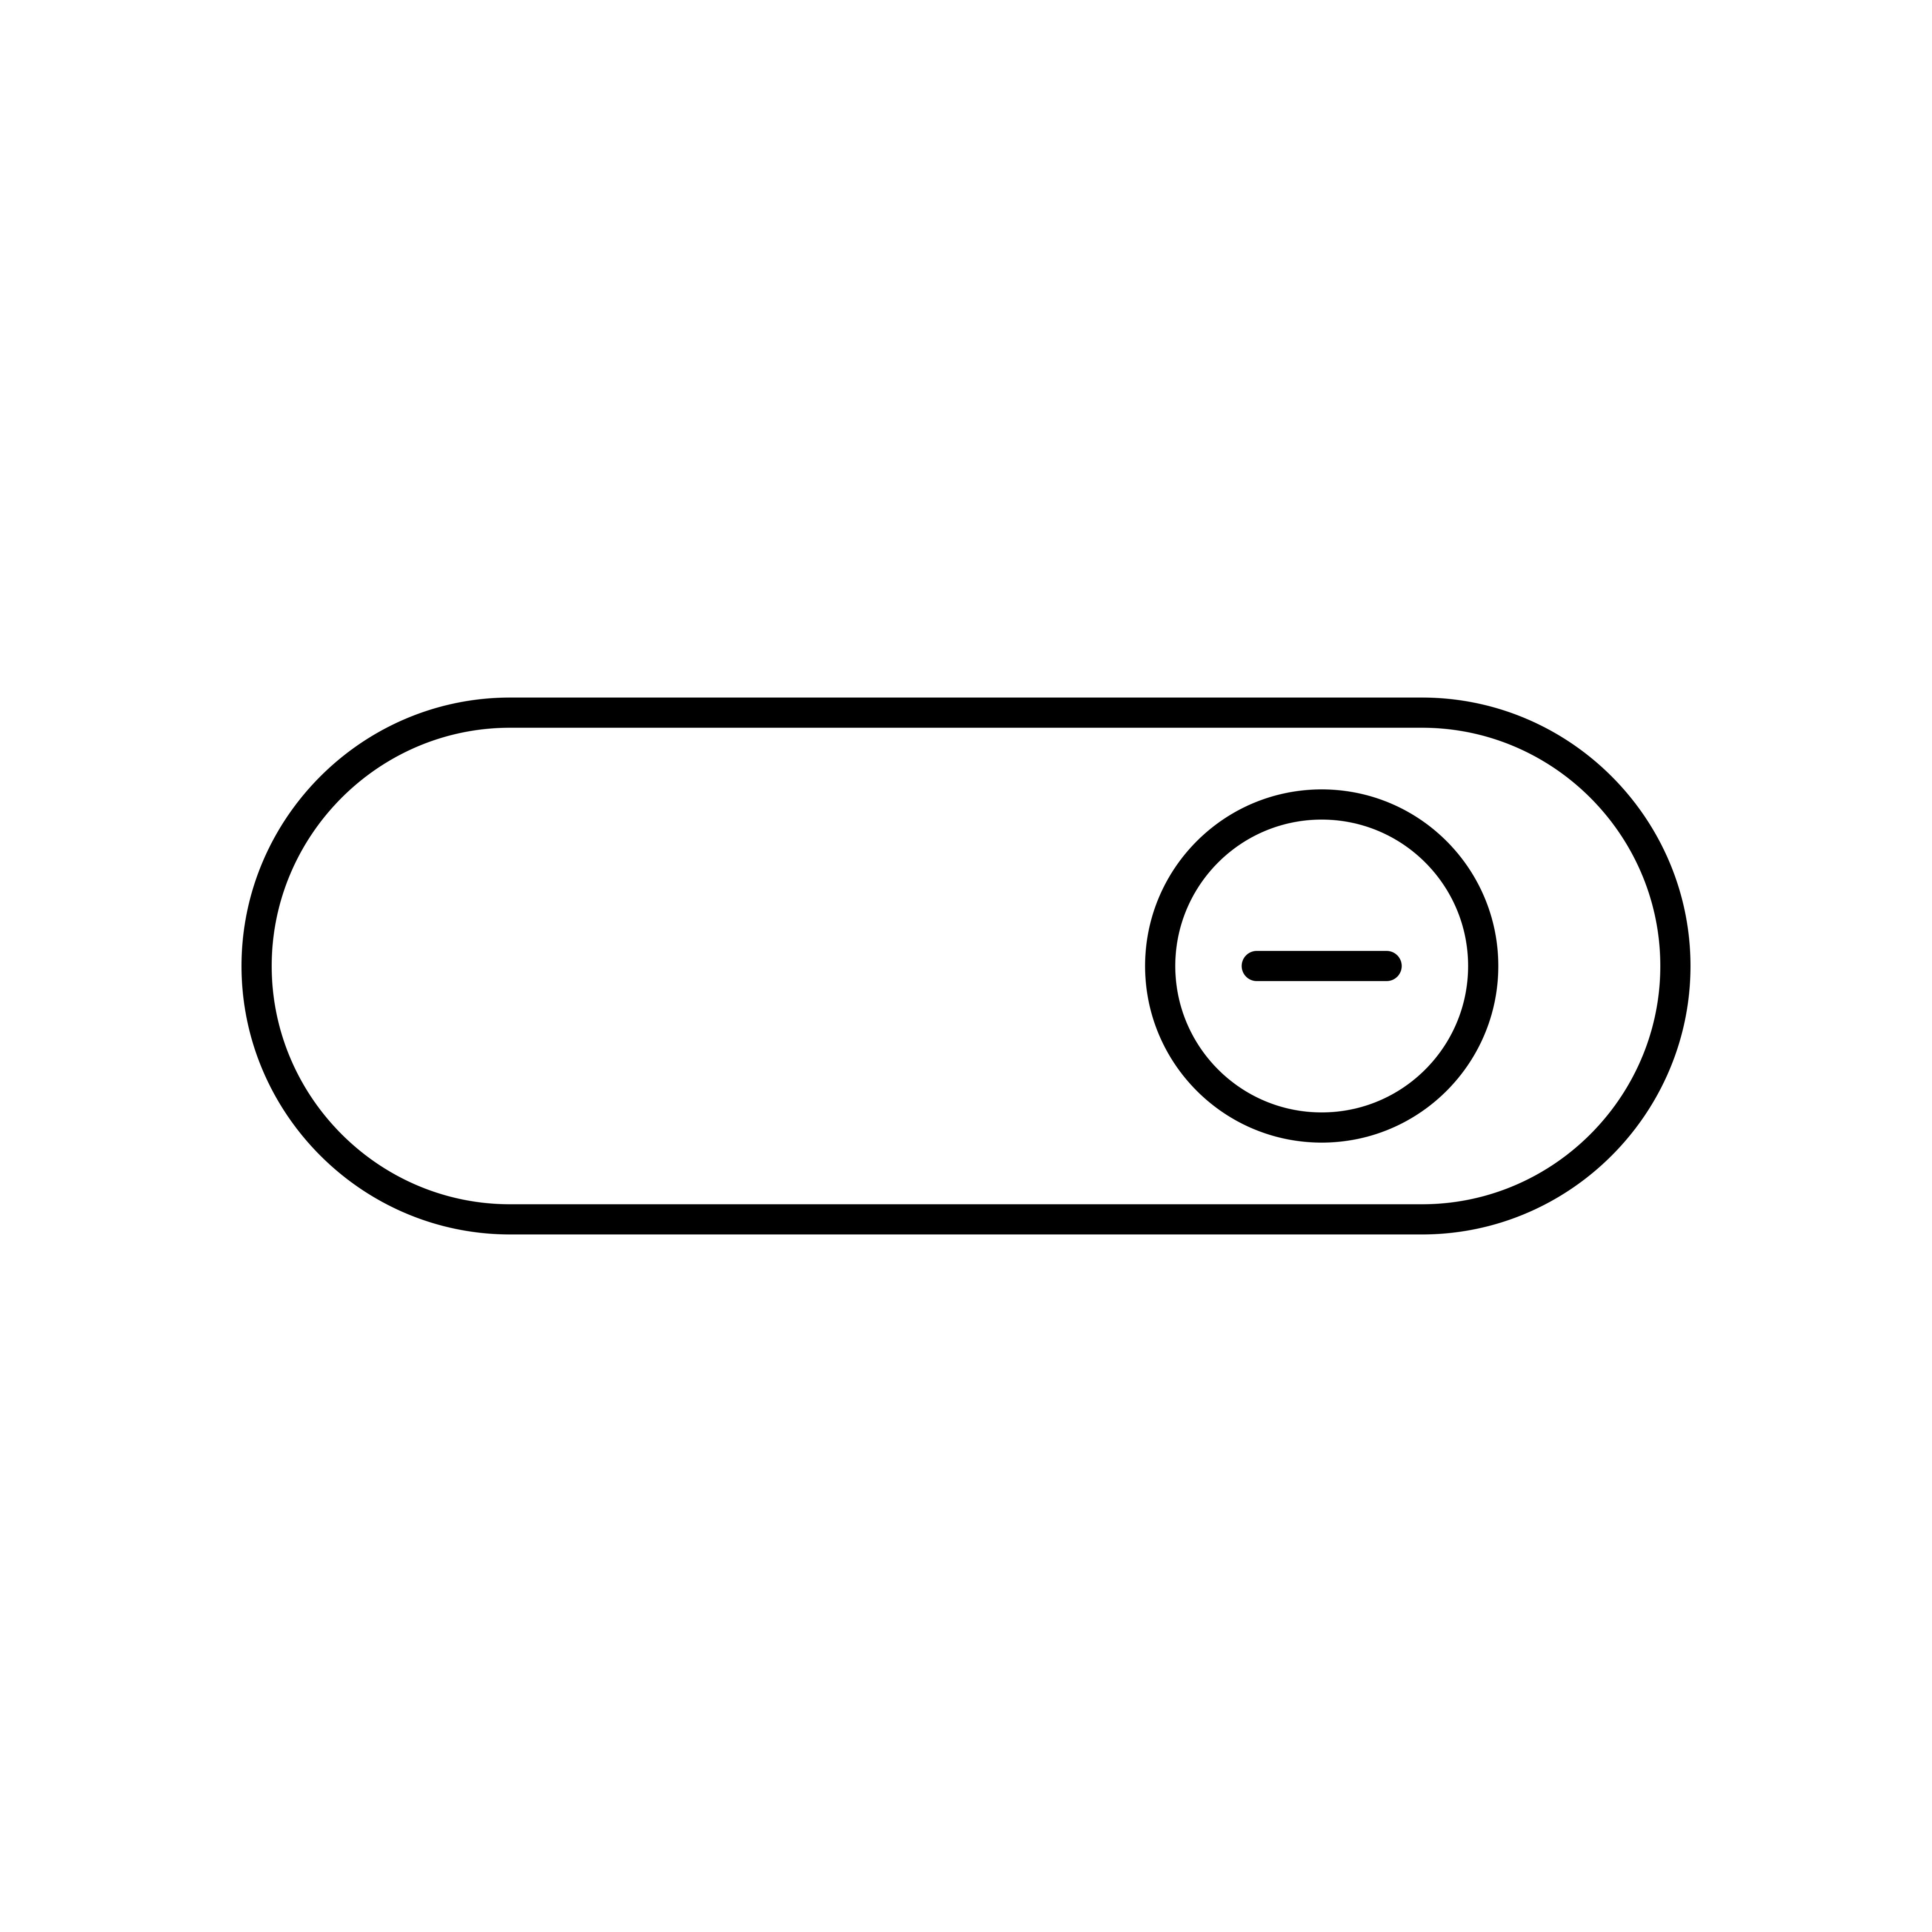 Switch On Line Black Icon